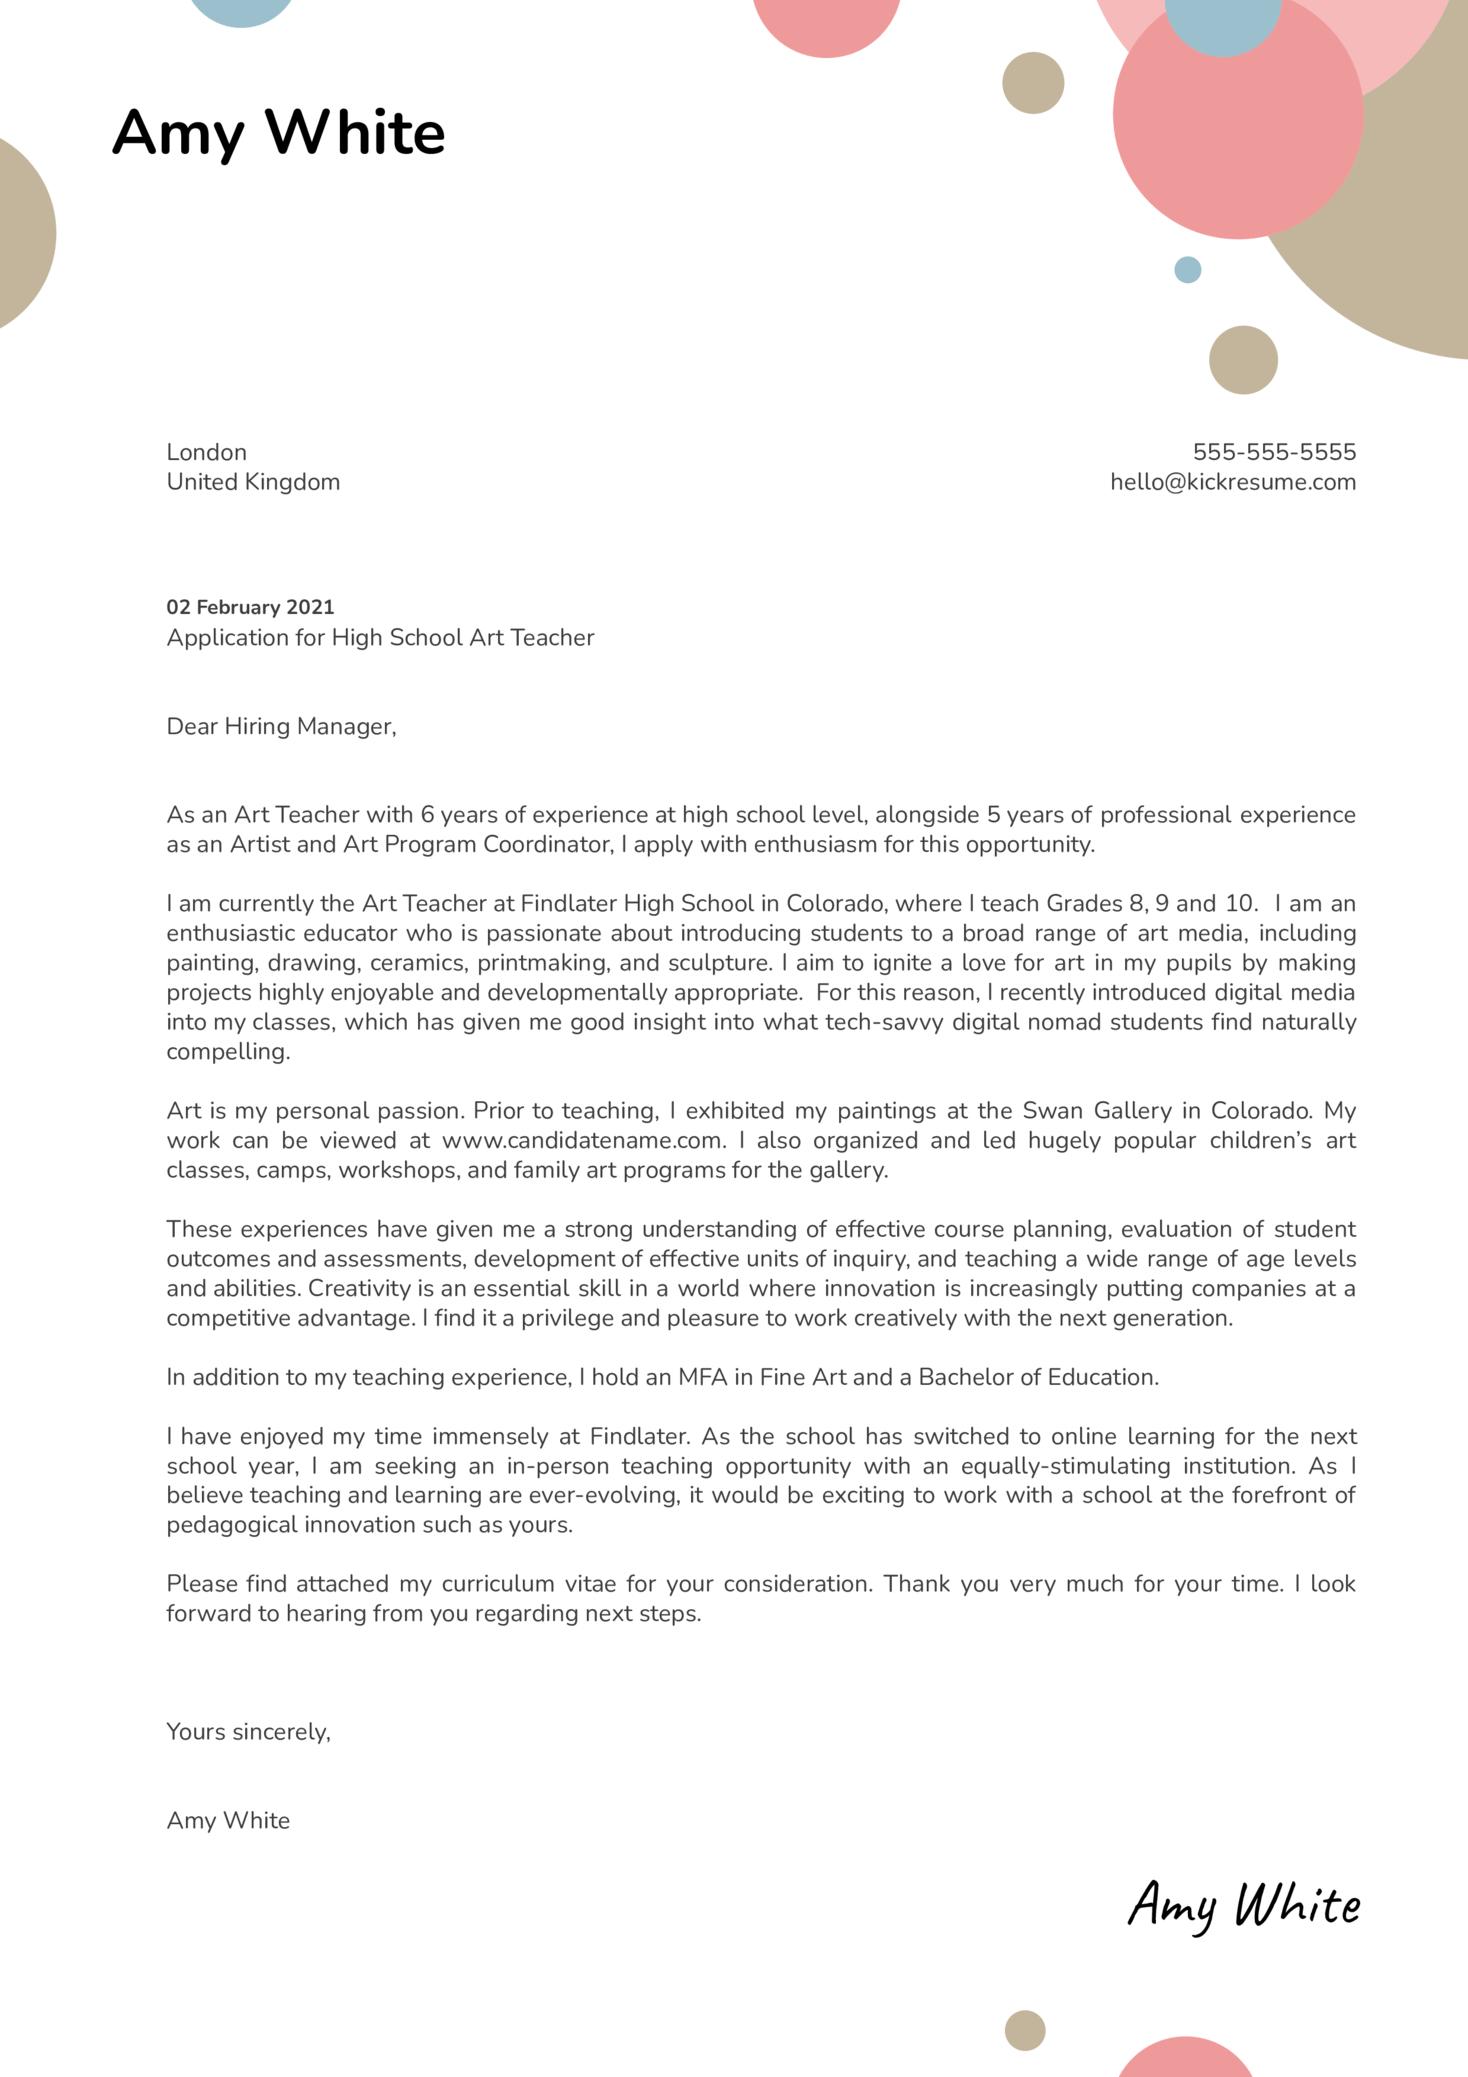 High School Art Teacher Cover Letter Template